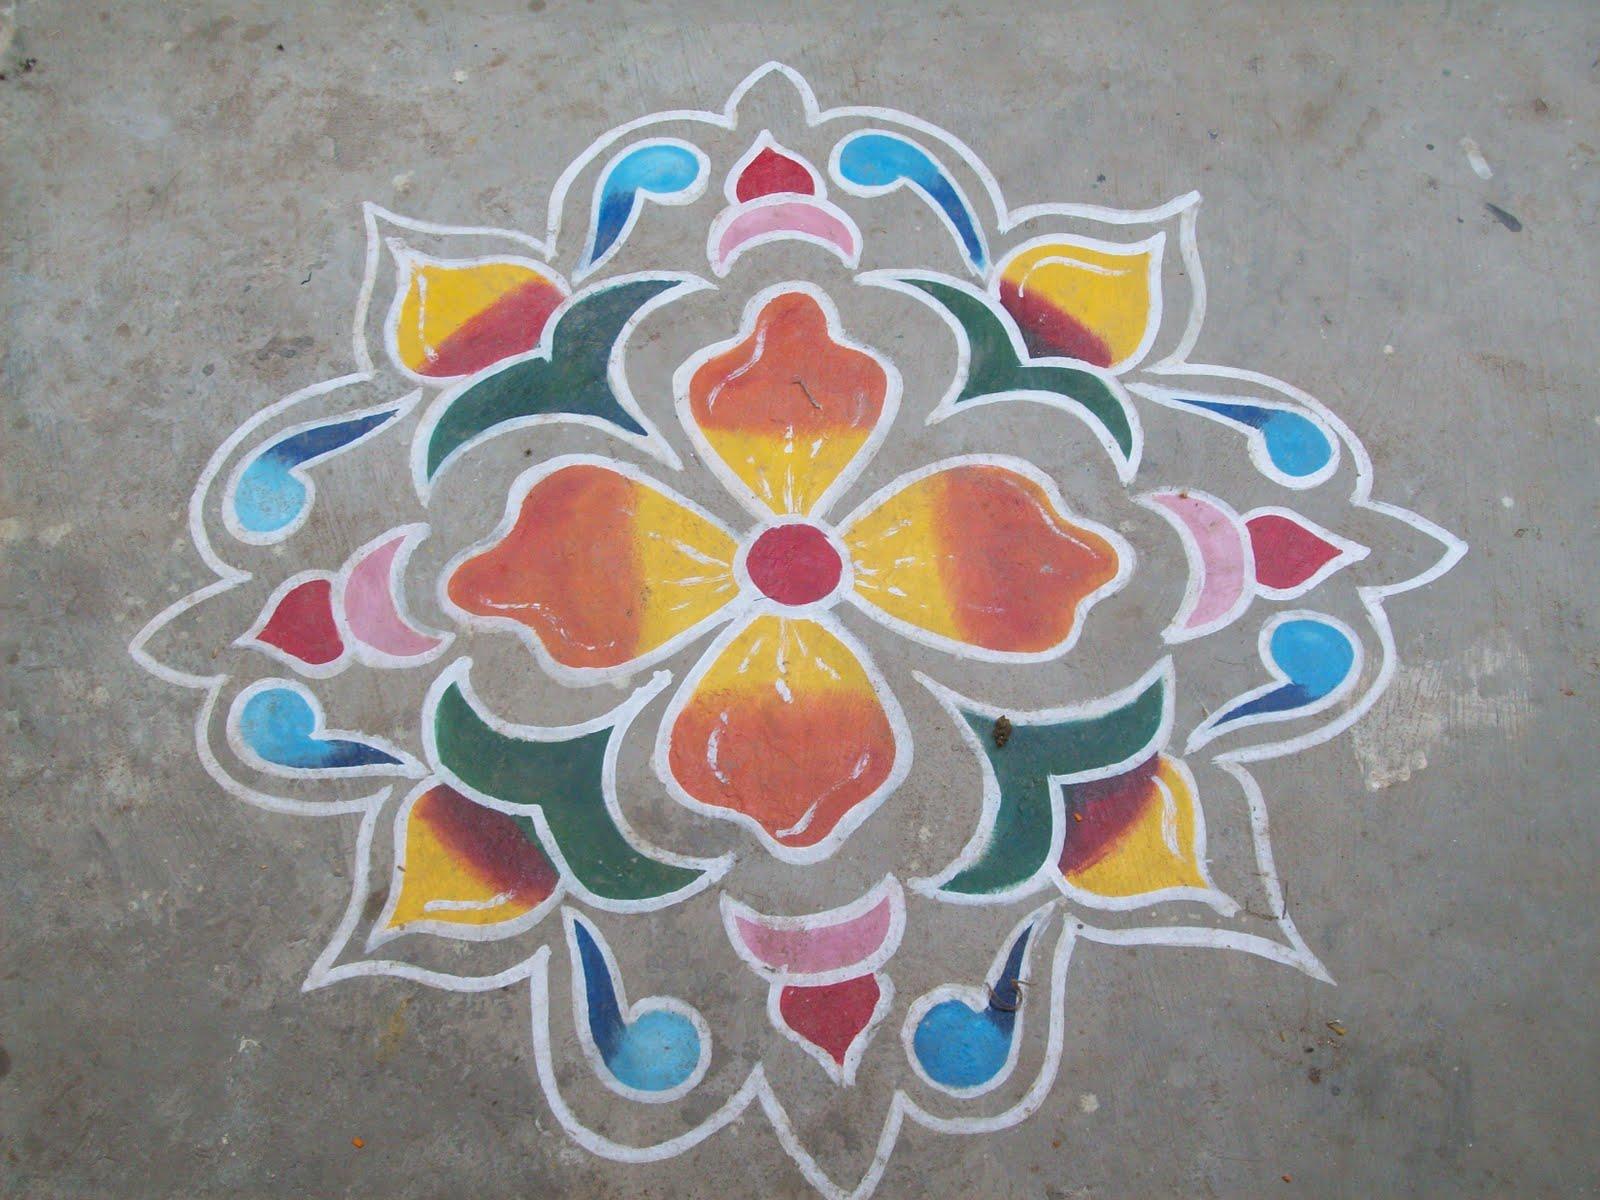 My place rangoli design 3 for Door rangoli design images